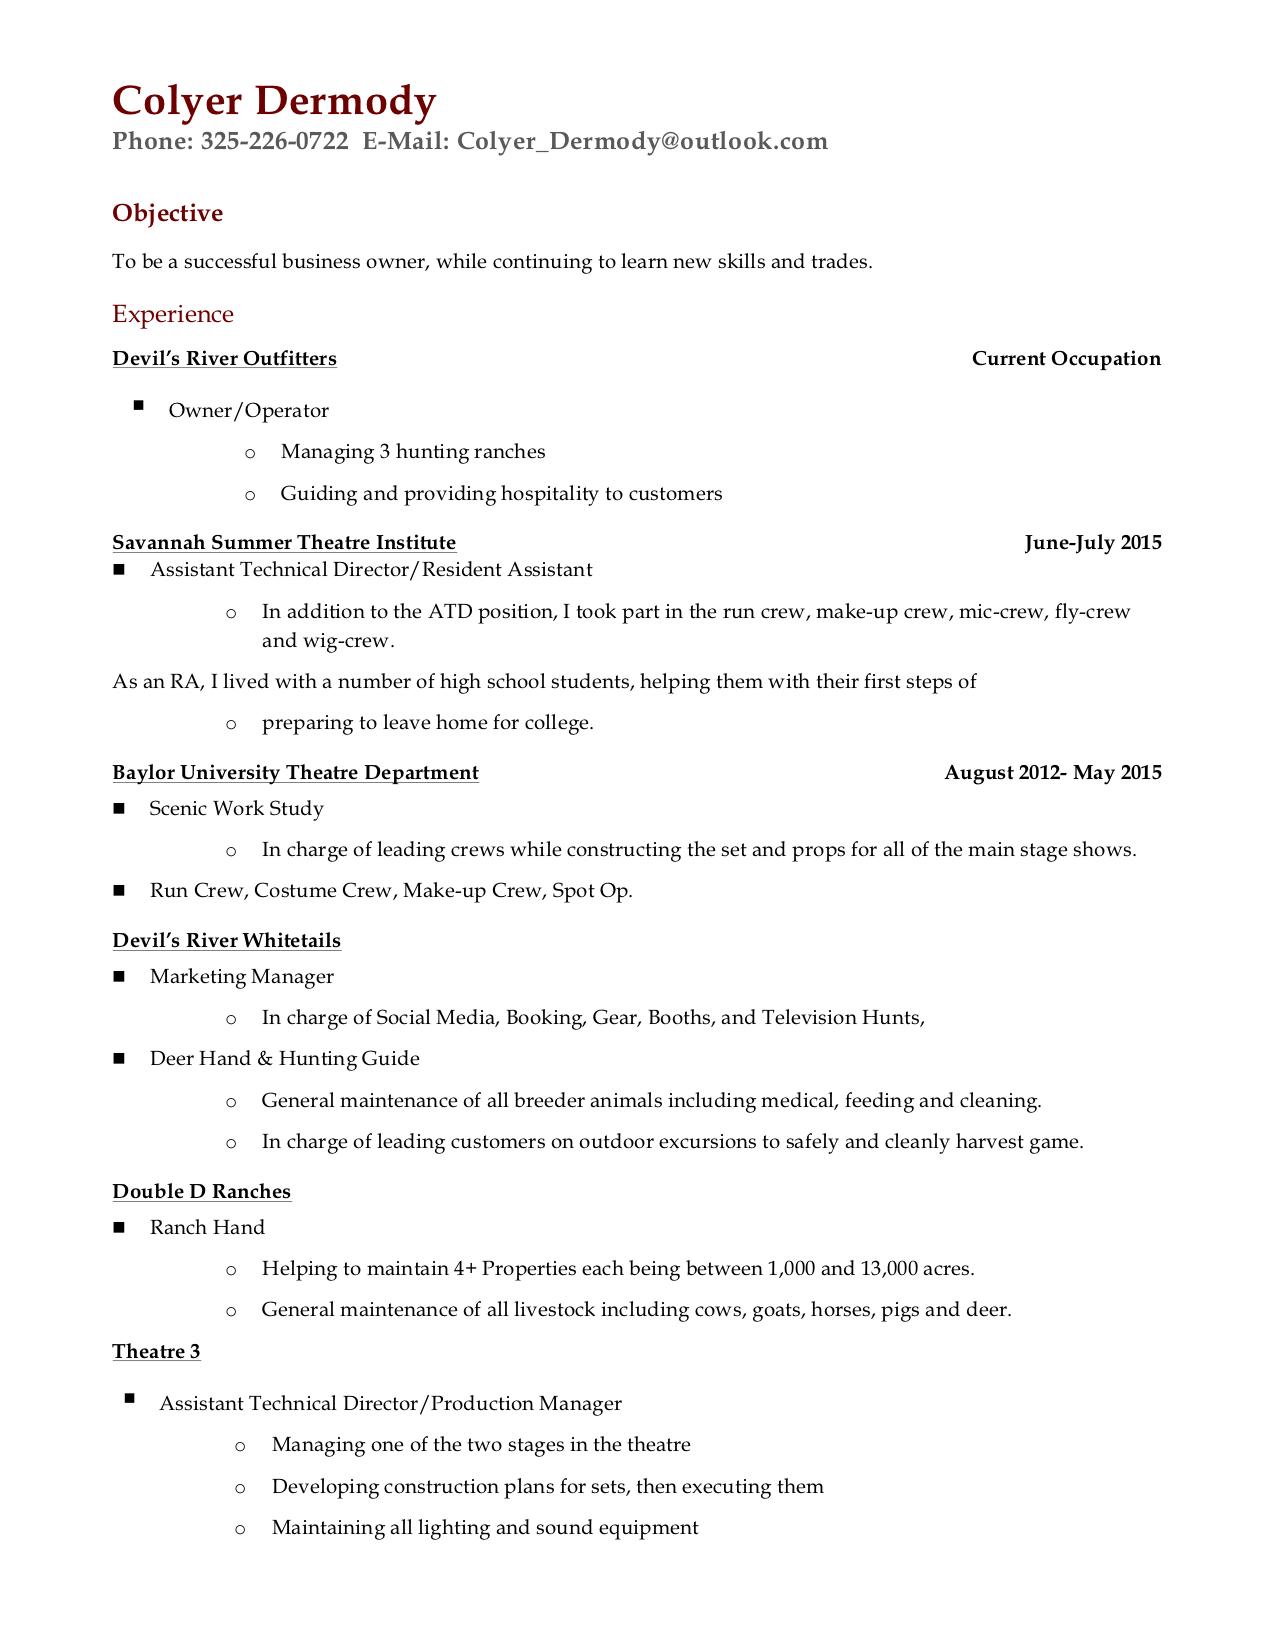 Resumes — Colyer Dermody